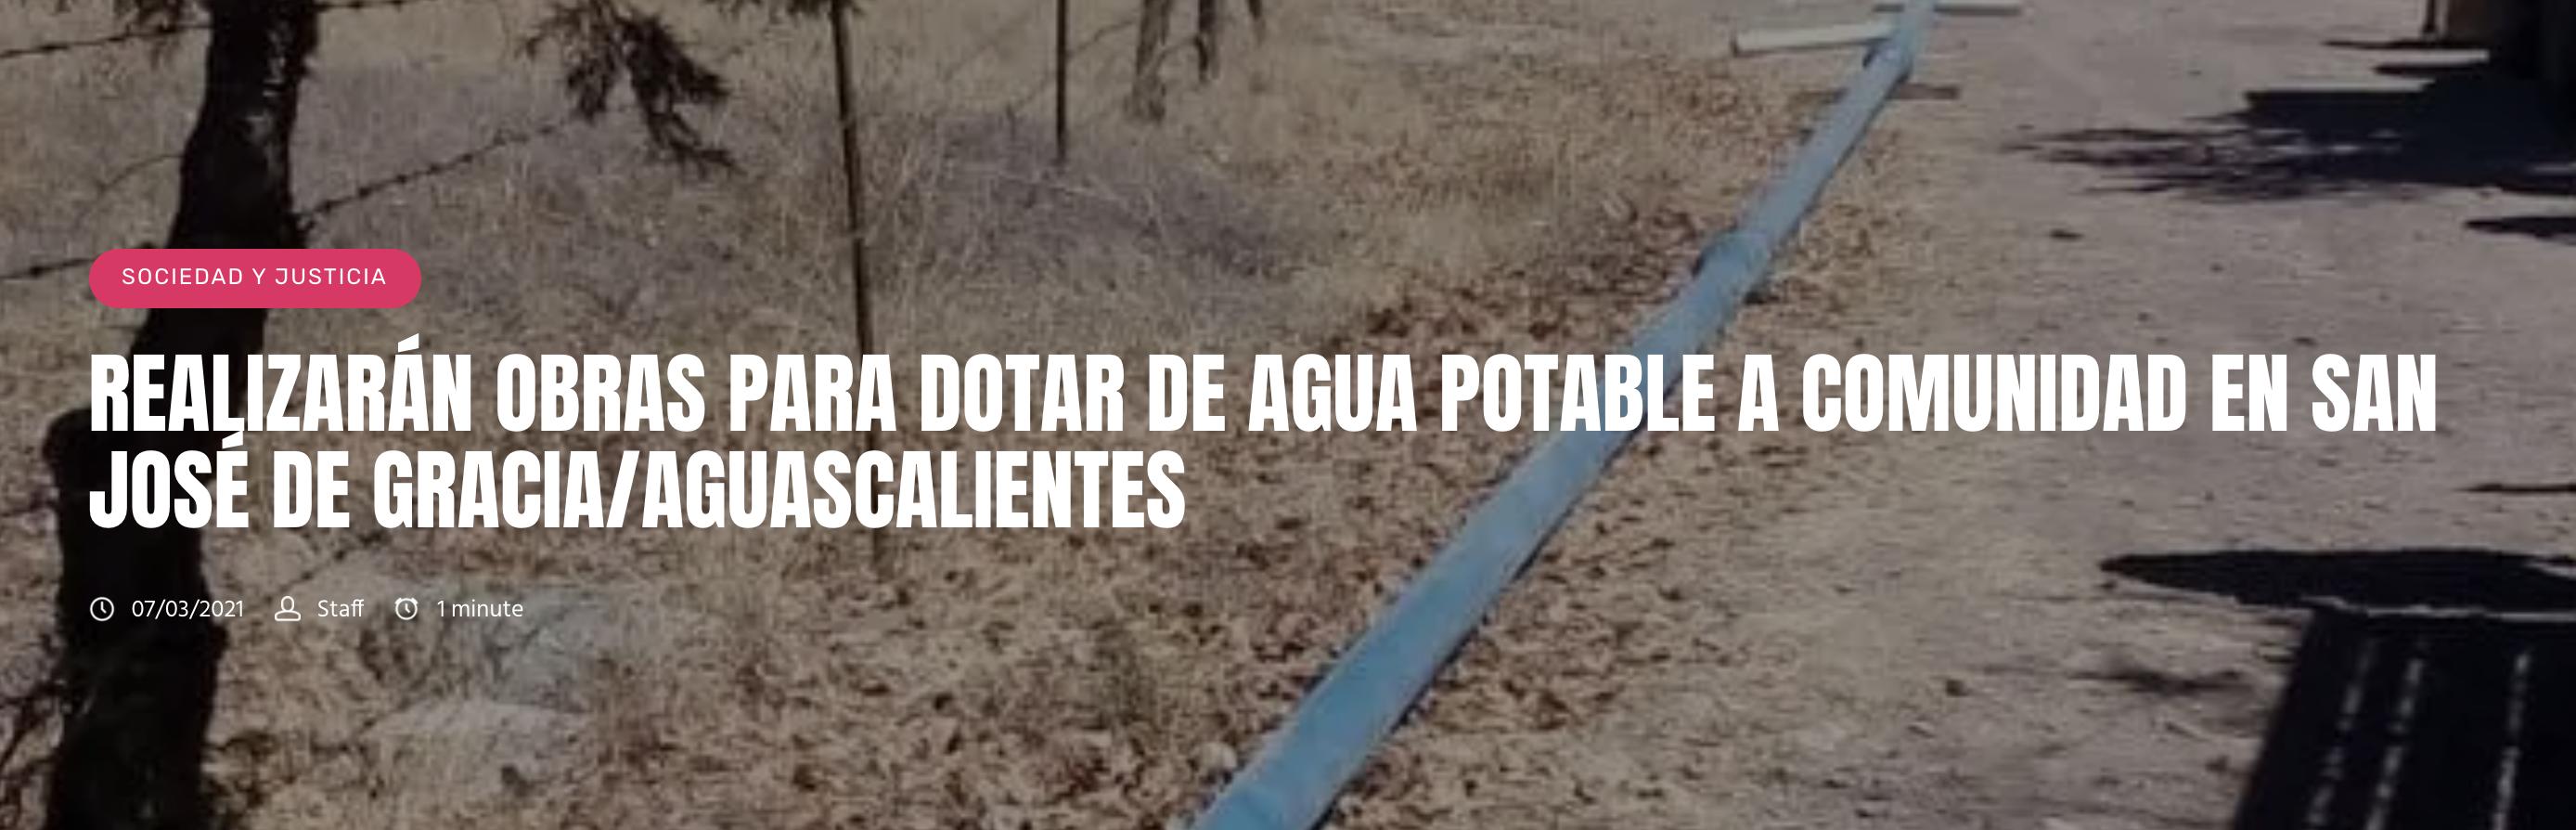 Ags: Realizarán obras para dotar de agua potable a comunidad en San José Gracia/Aguascalientes (LJA.mx)